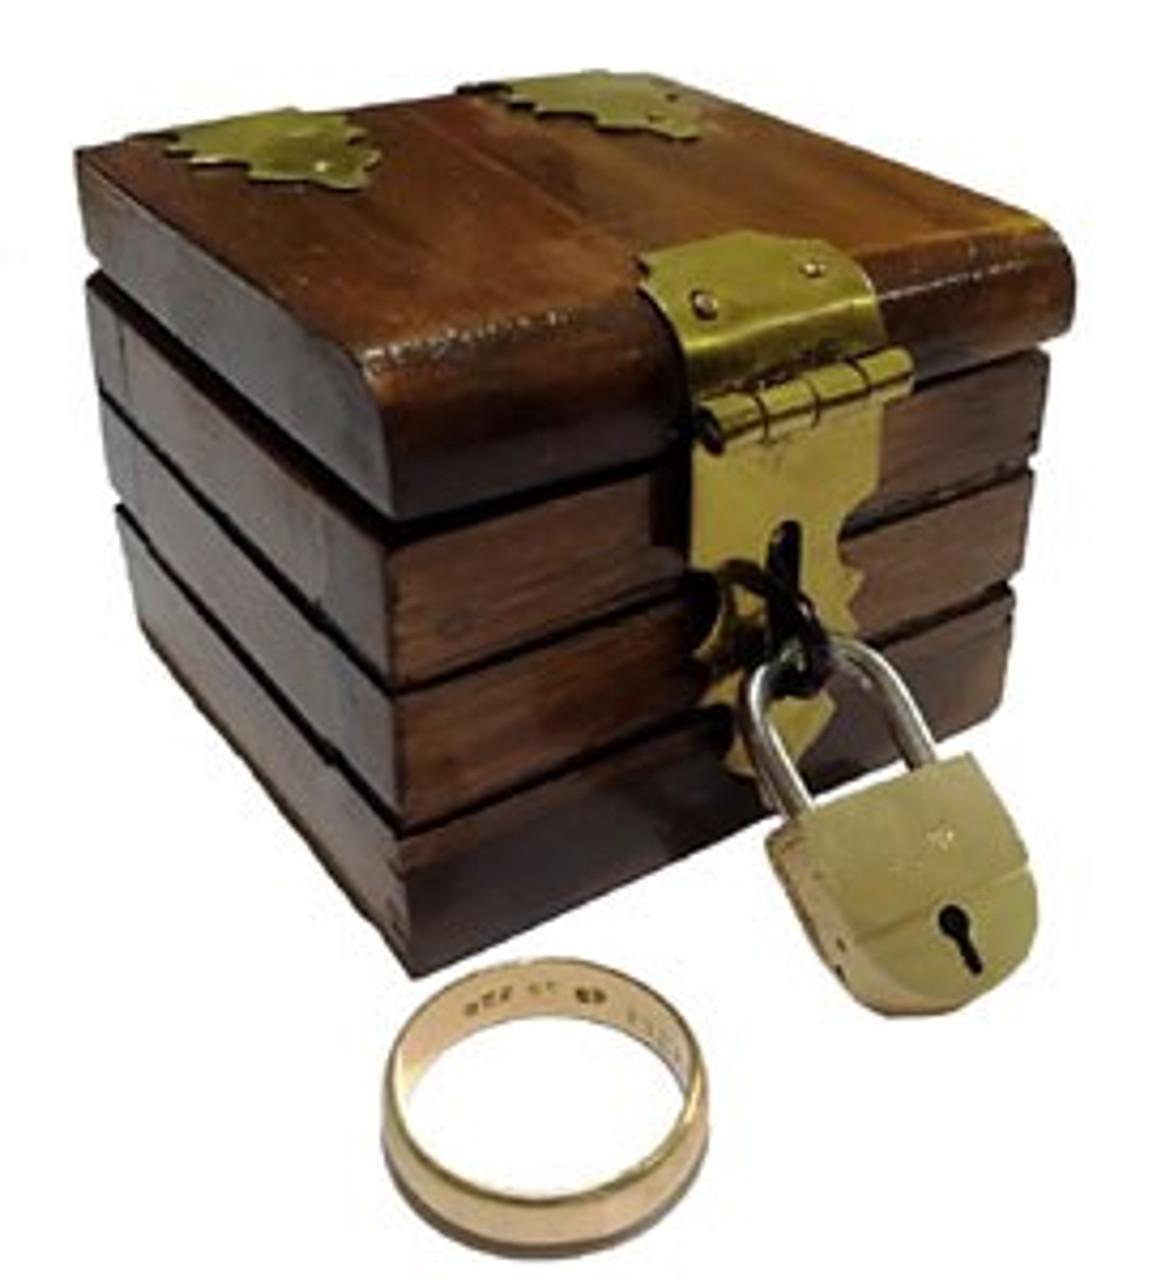 Coin Ring Box Vanish Magic Trick